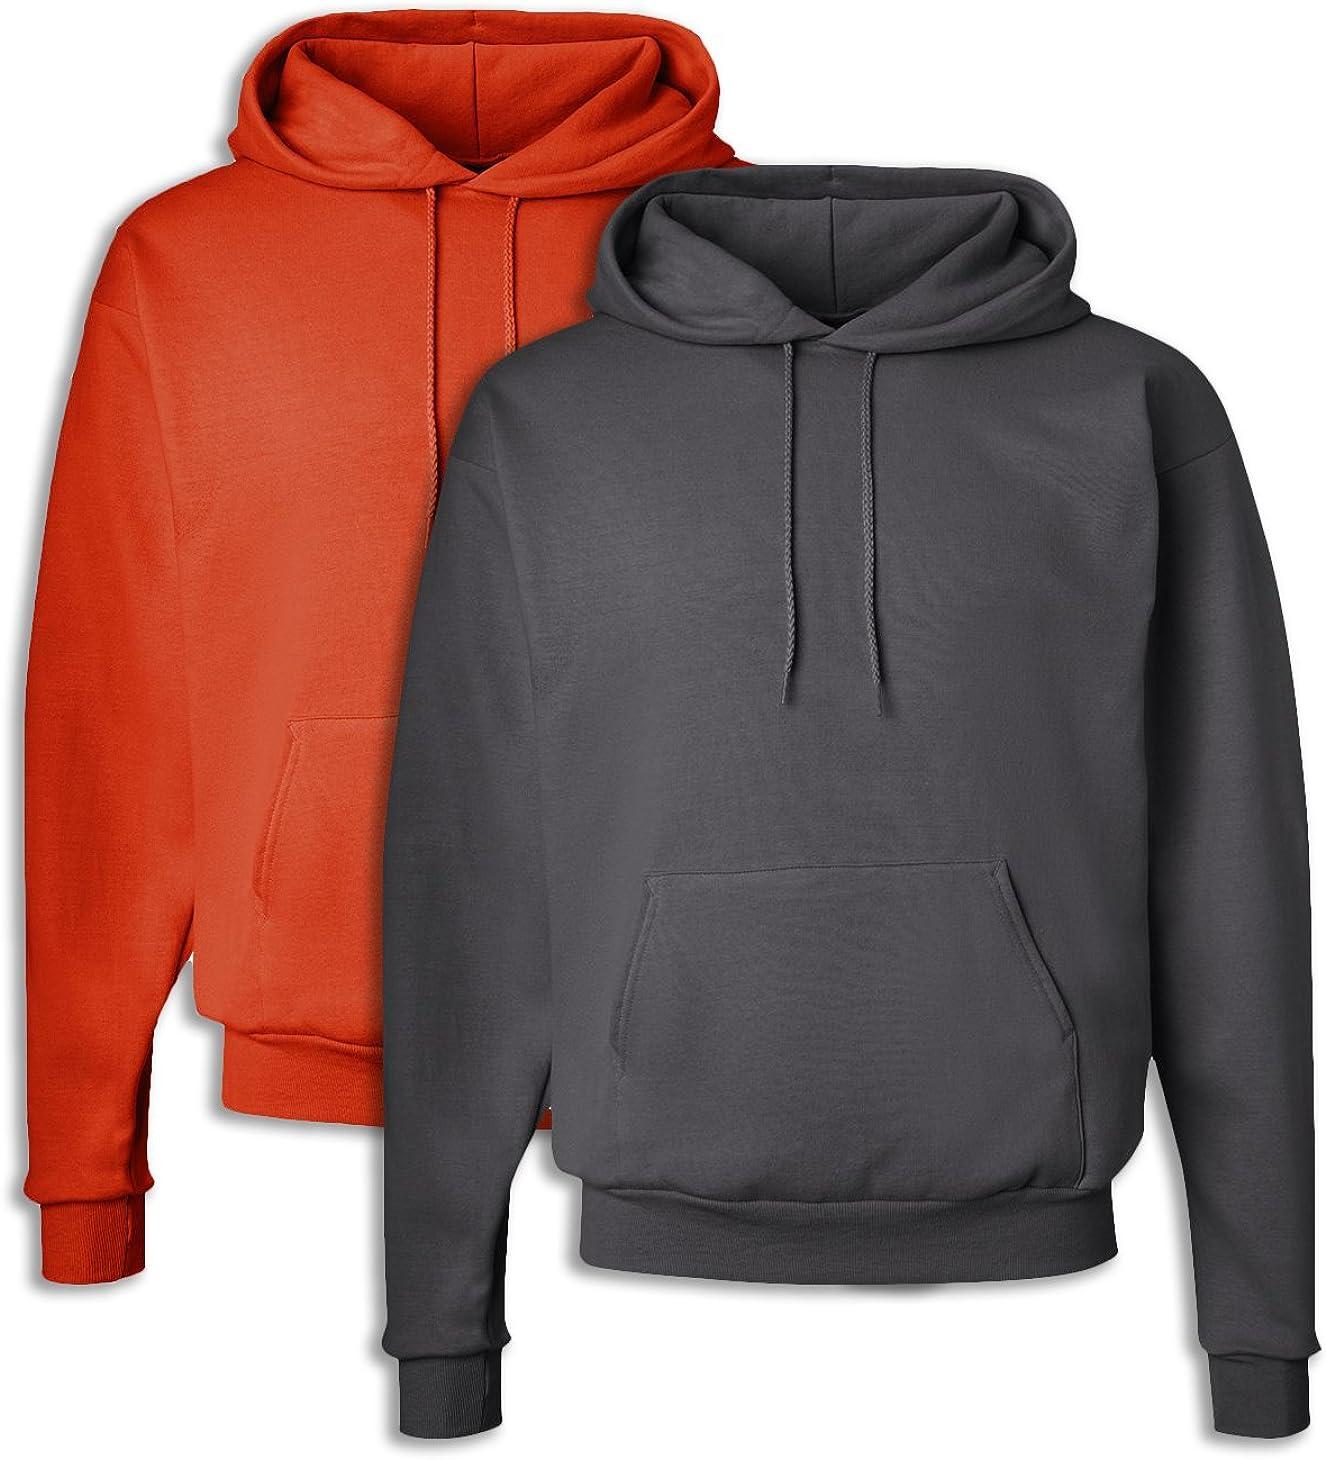 1 Smoke Grey Hanes P170 Mens EcoSmart Hooded Sweatshirt XL 1 Orange